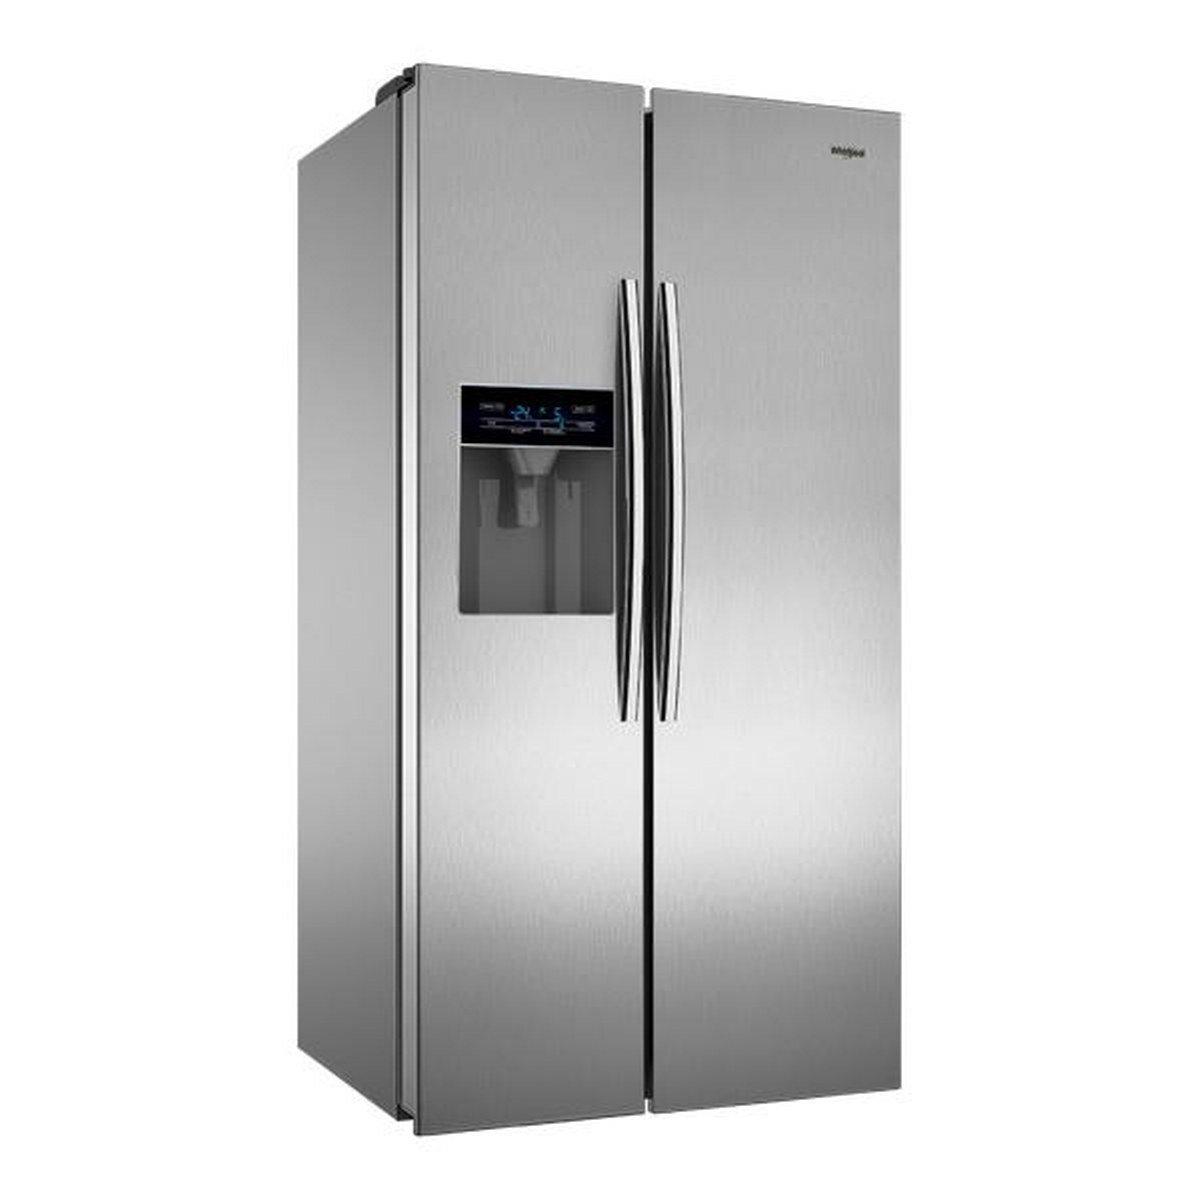 Whirlpool 568 L Frost Free Side-by-Side Refrigerator(SBS 600, Steel):  Amazon.in: Home & Kitchen